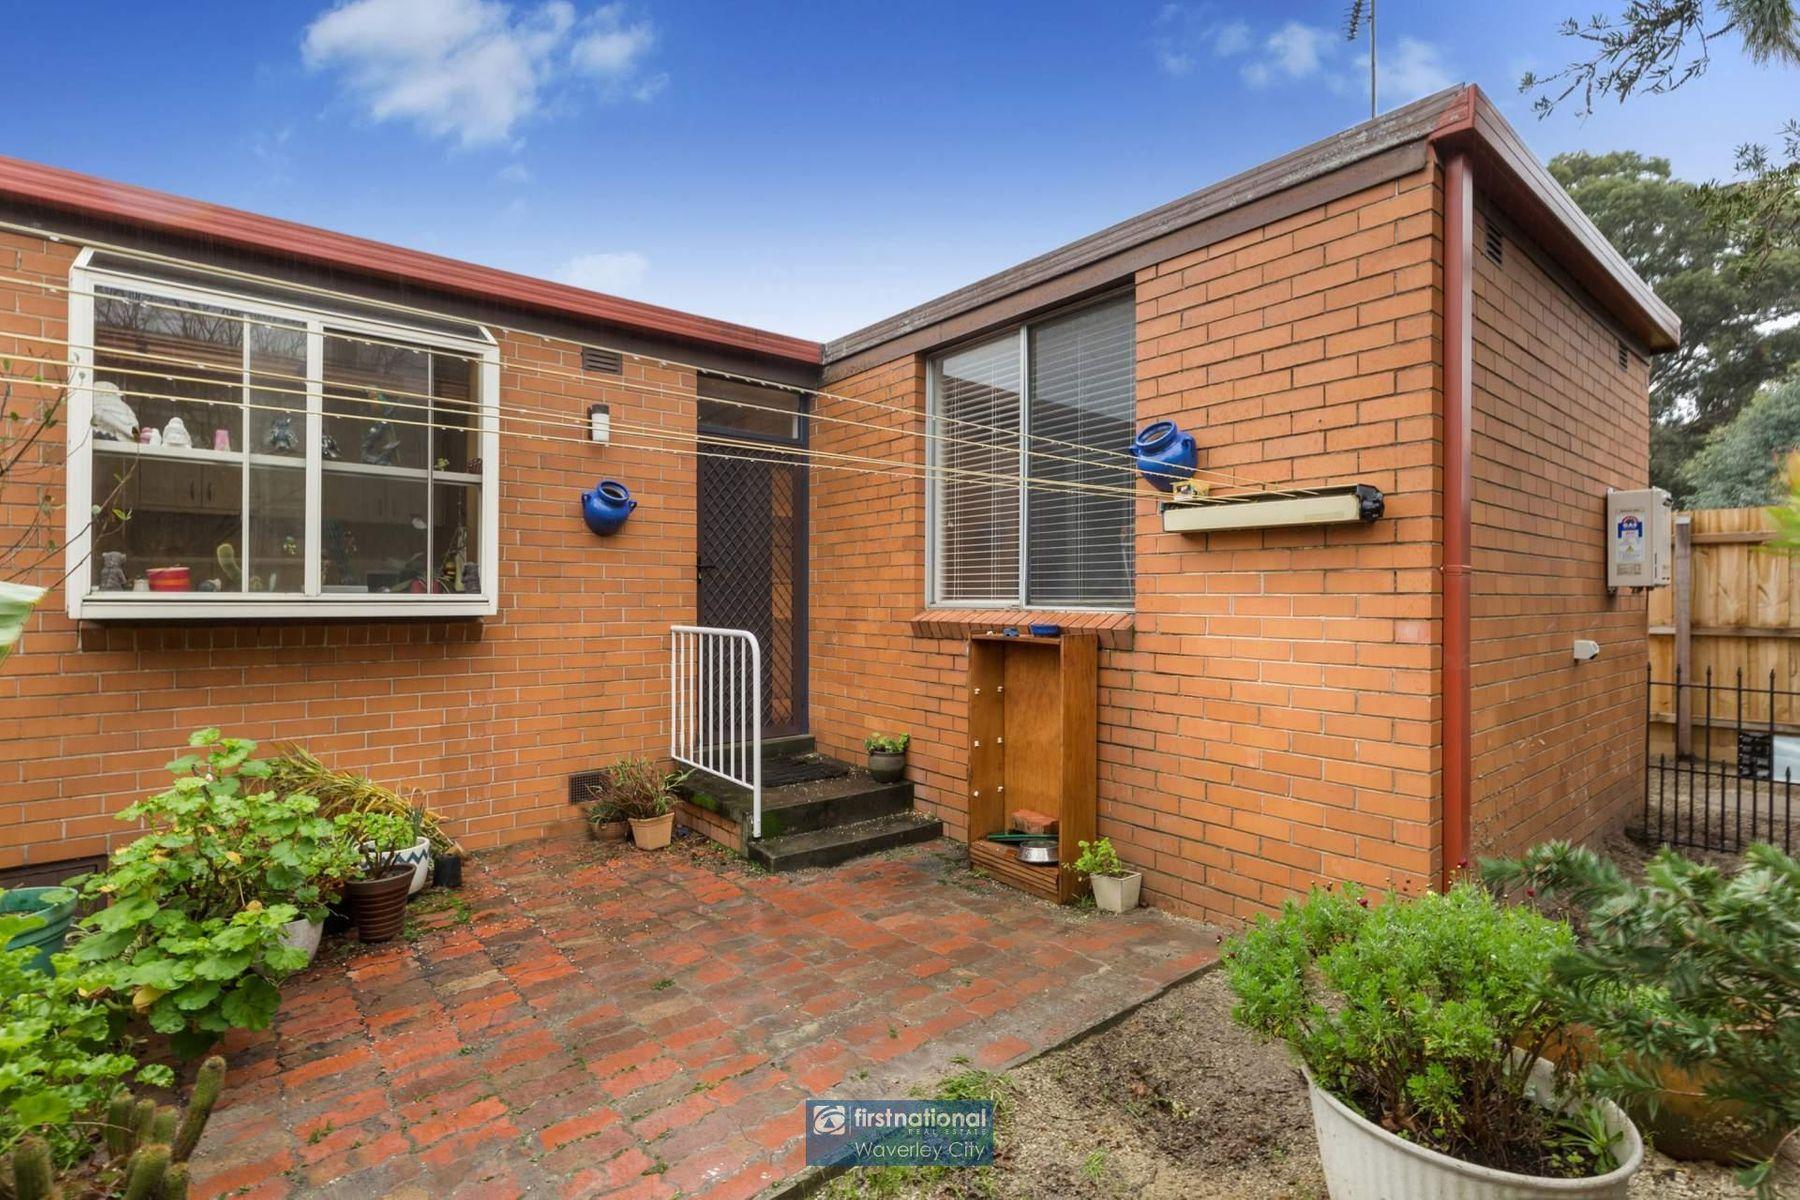 6/24 Shirley Avenue, Glen Waverley, VIC 3150